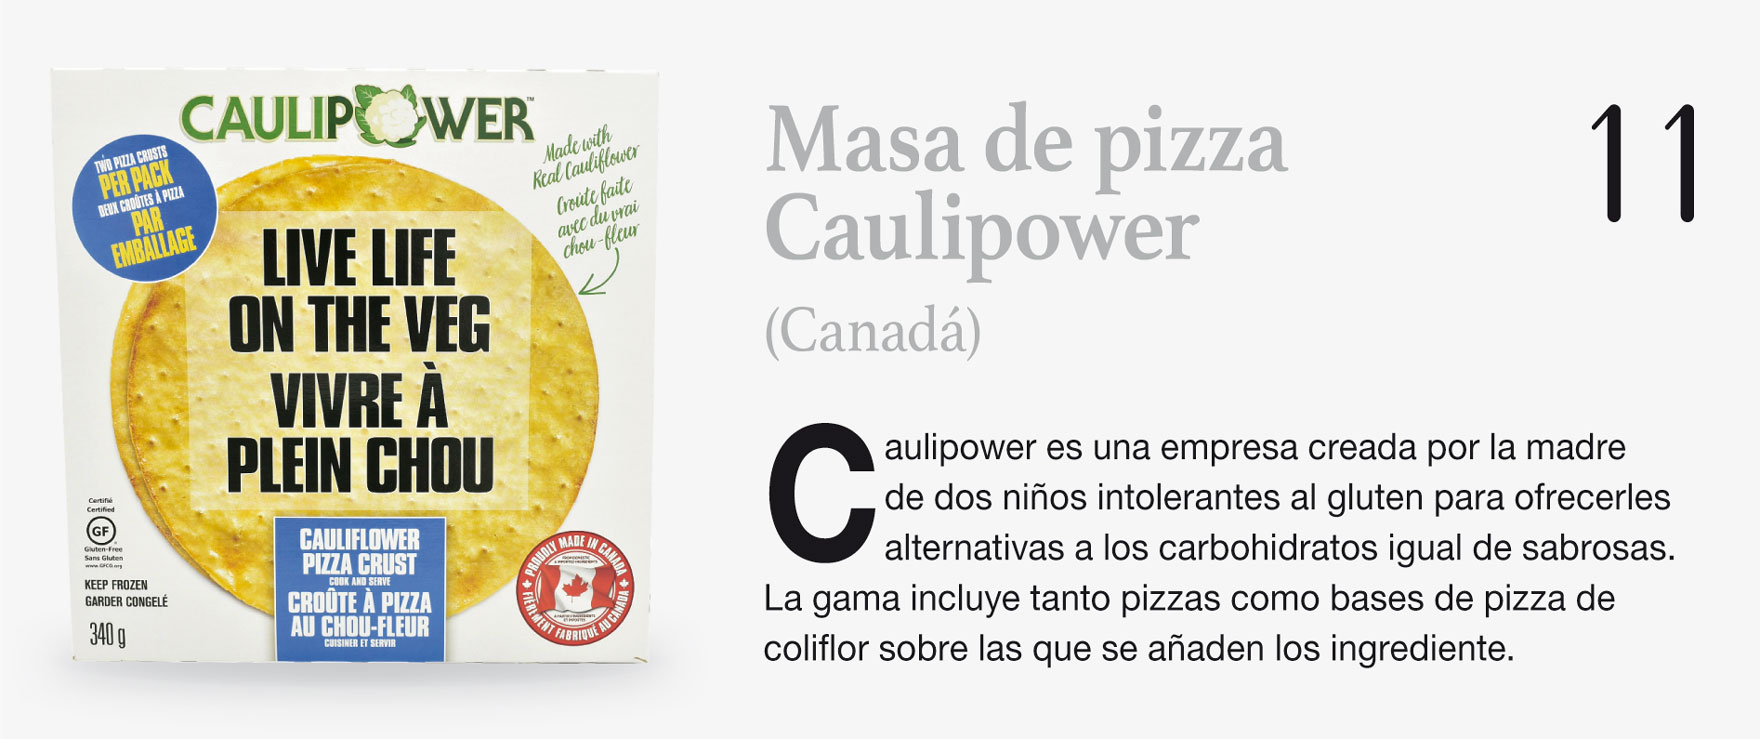 Masa de pizza Caulipower (Canadá)